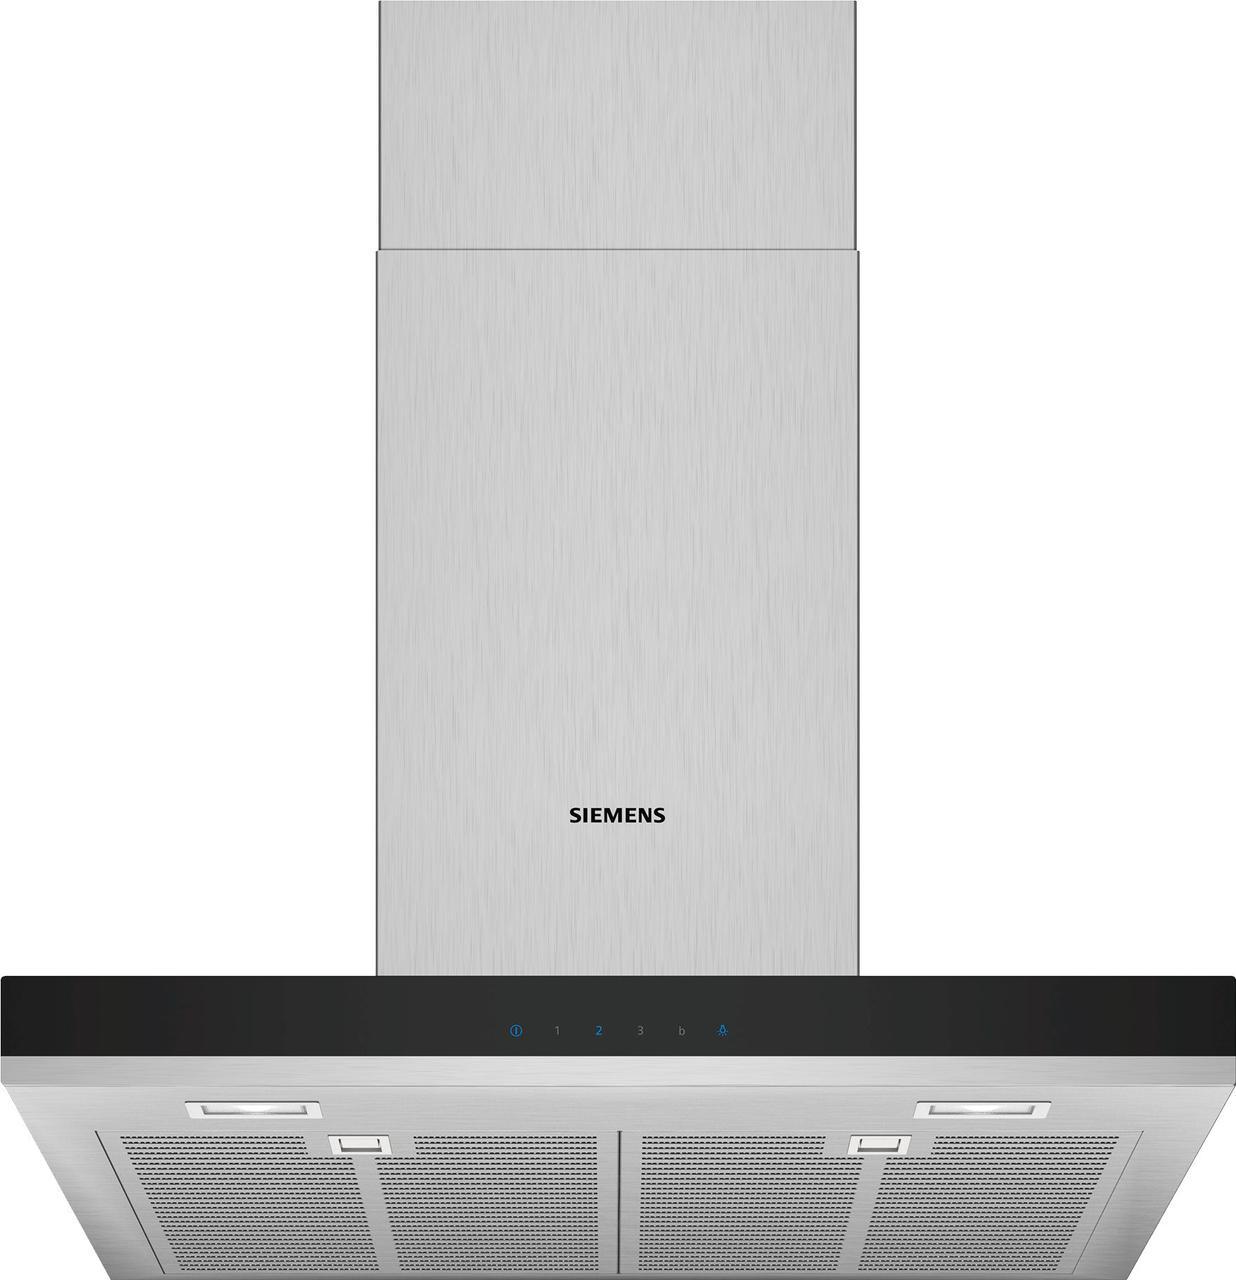 Кухонная вытяжка для настенного монтажа Siemens LC67BHM50